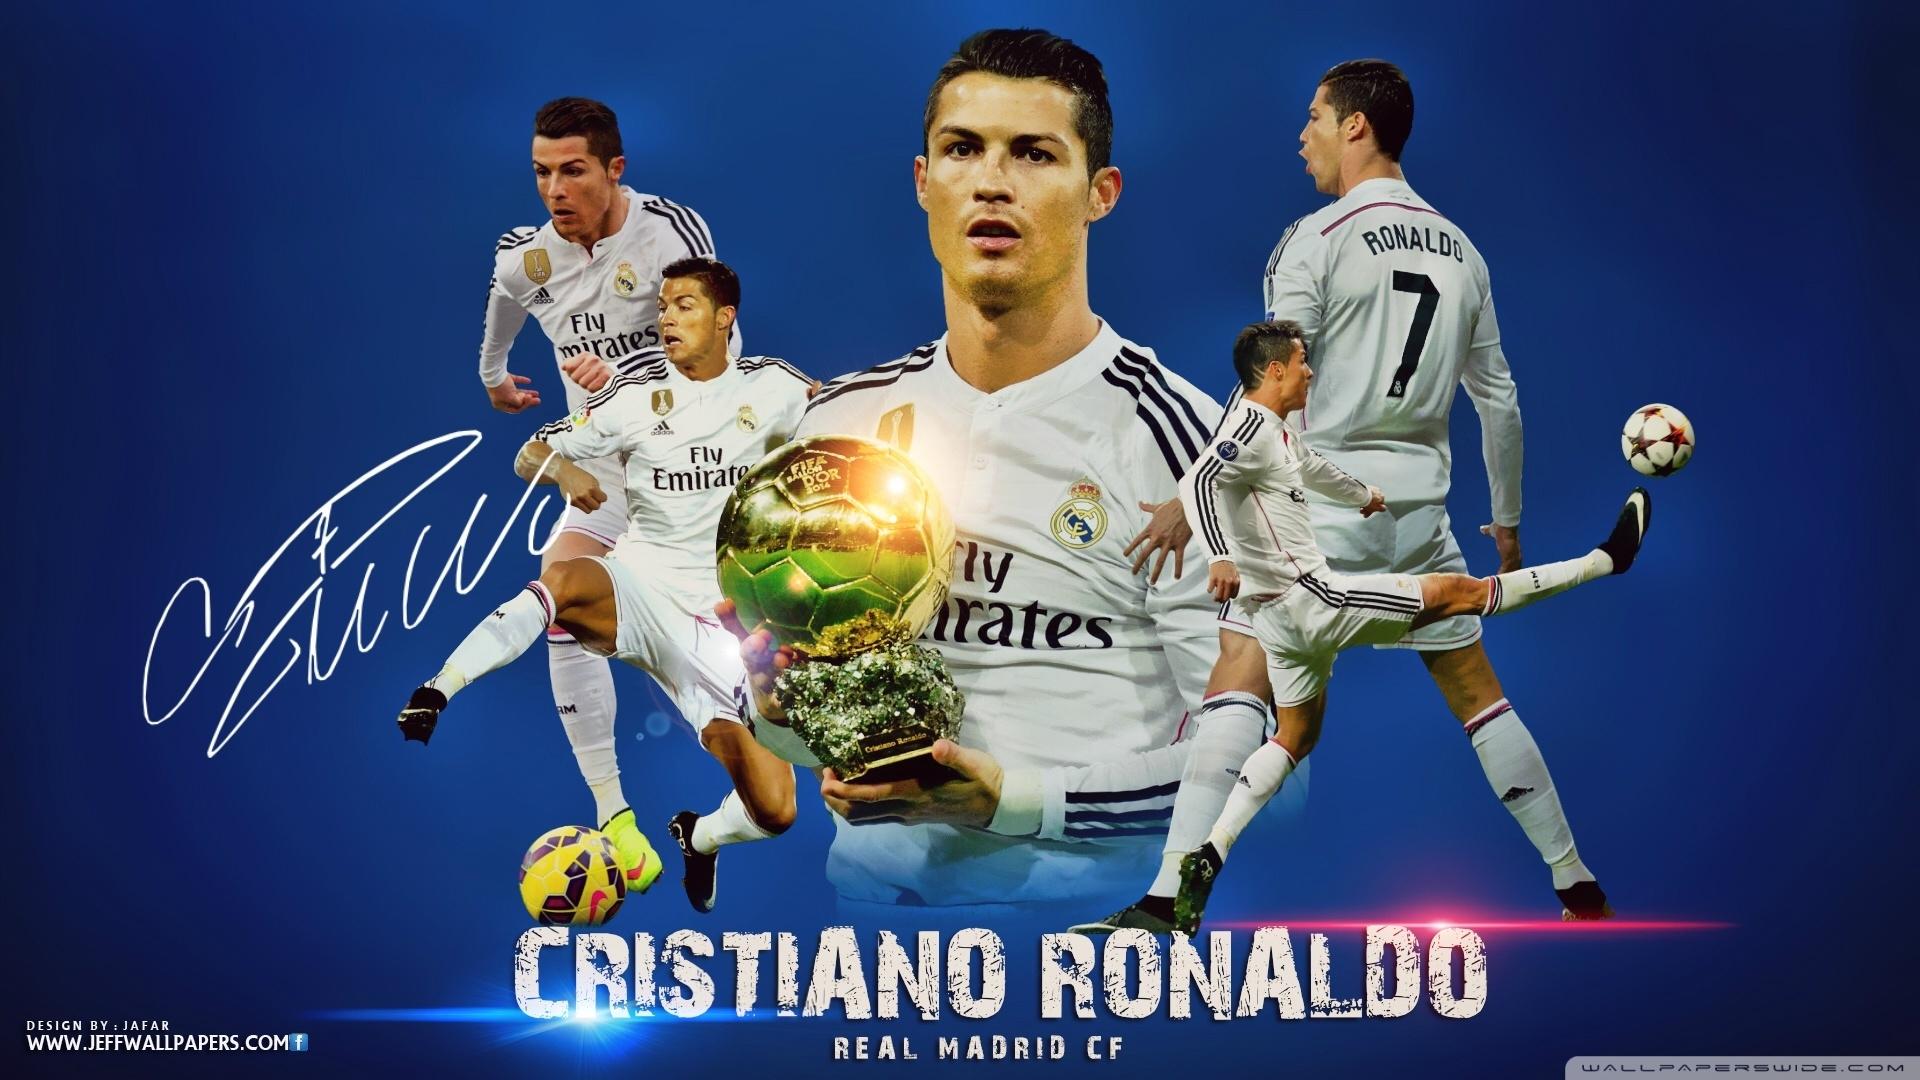 cristiano ronaldo real madrid 2015 ❤ 4k hd desktop wallpaper for 4k